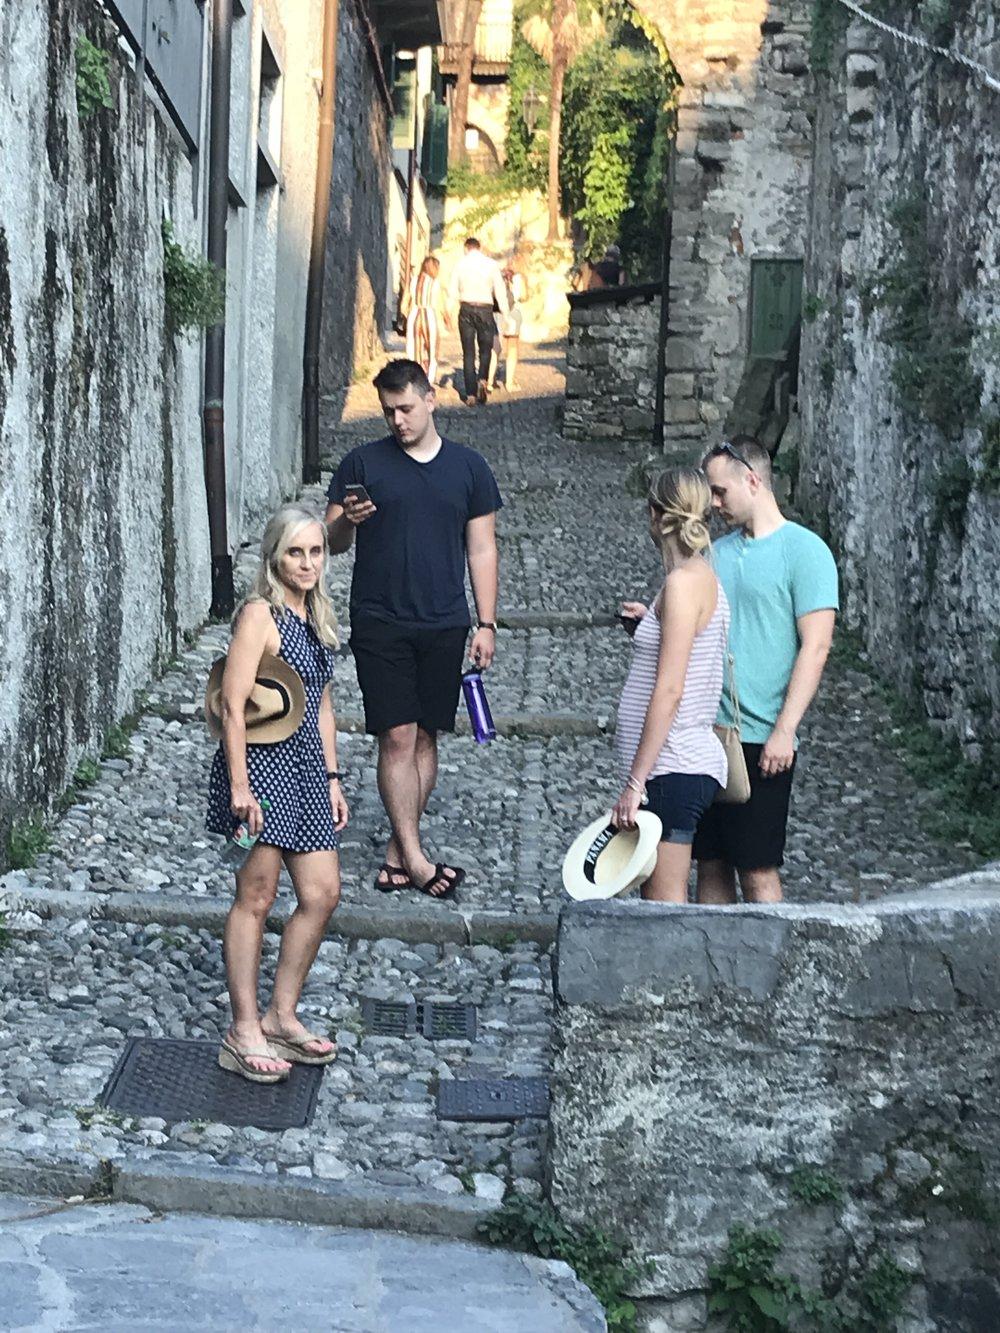 Exploring the steep cobblestone streets of Lake Como.